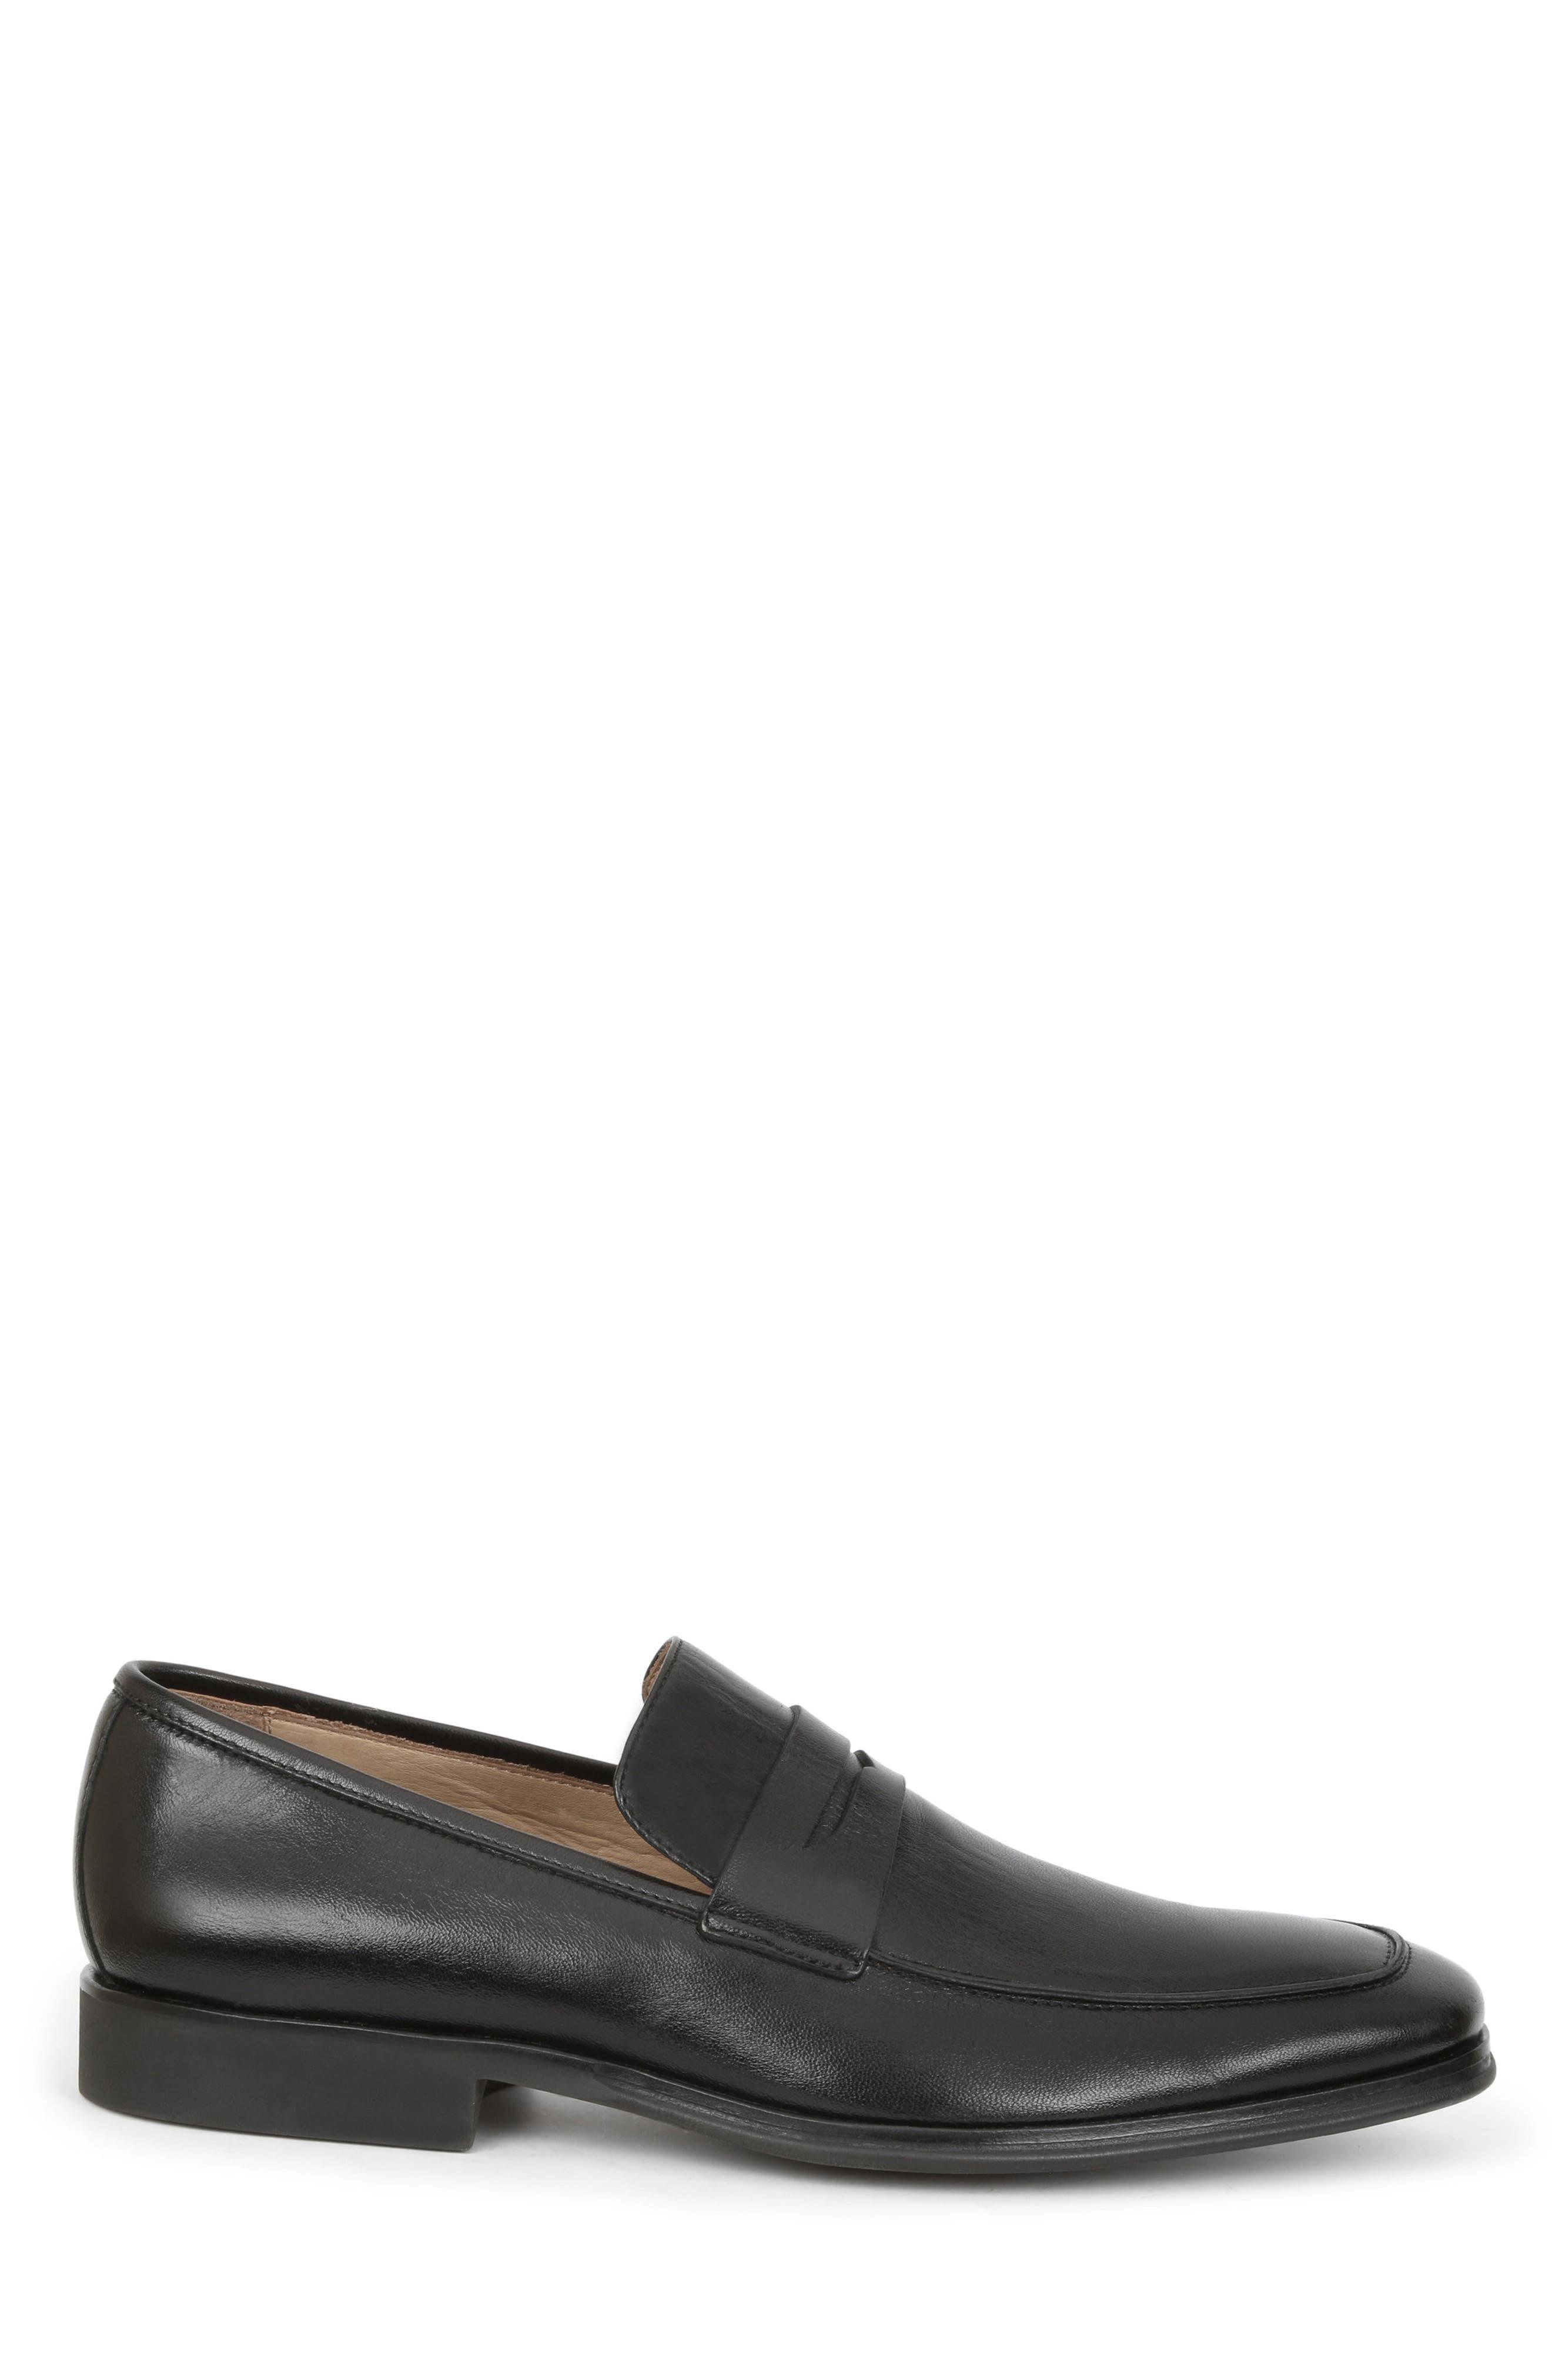 Ragusa Penny Loafer,                             Alternate thumbnail 3, color,                             Black Leather